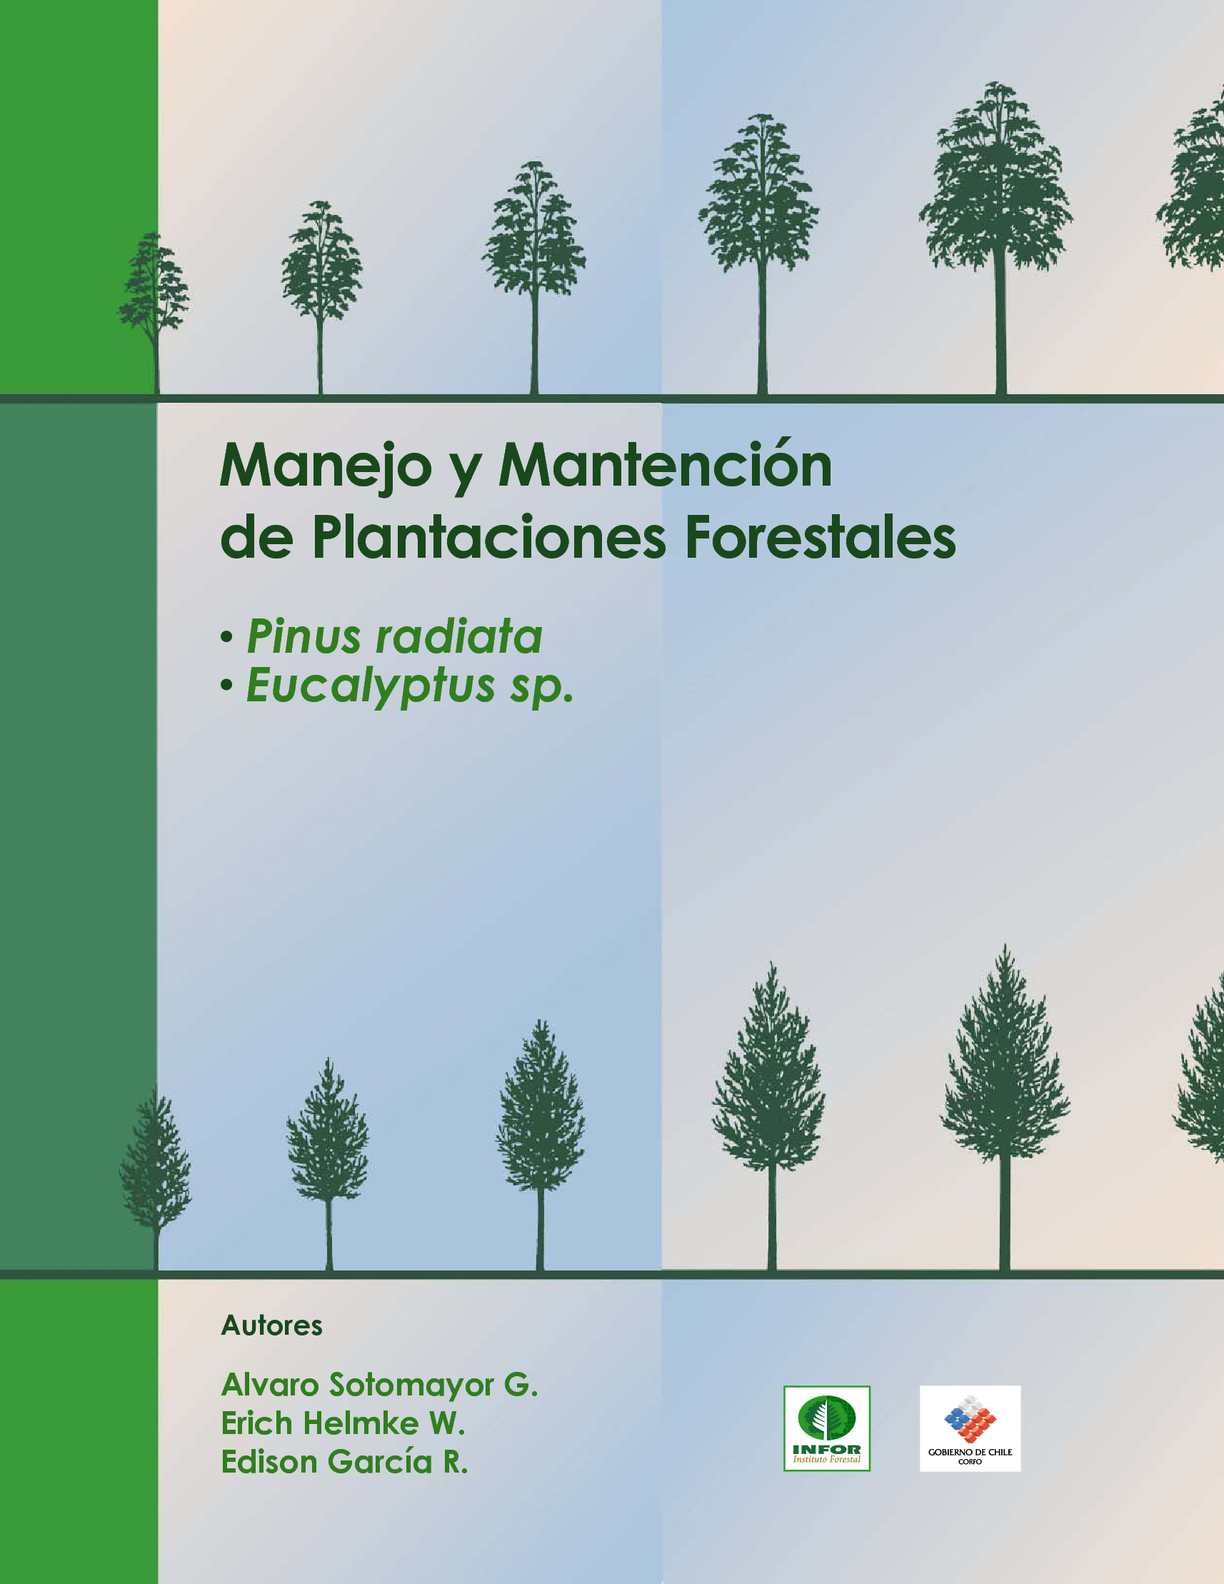 Calam o manuales manejo de plantaciones forestales for Manejo de viveros forestales